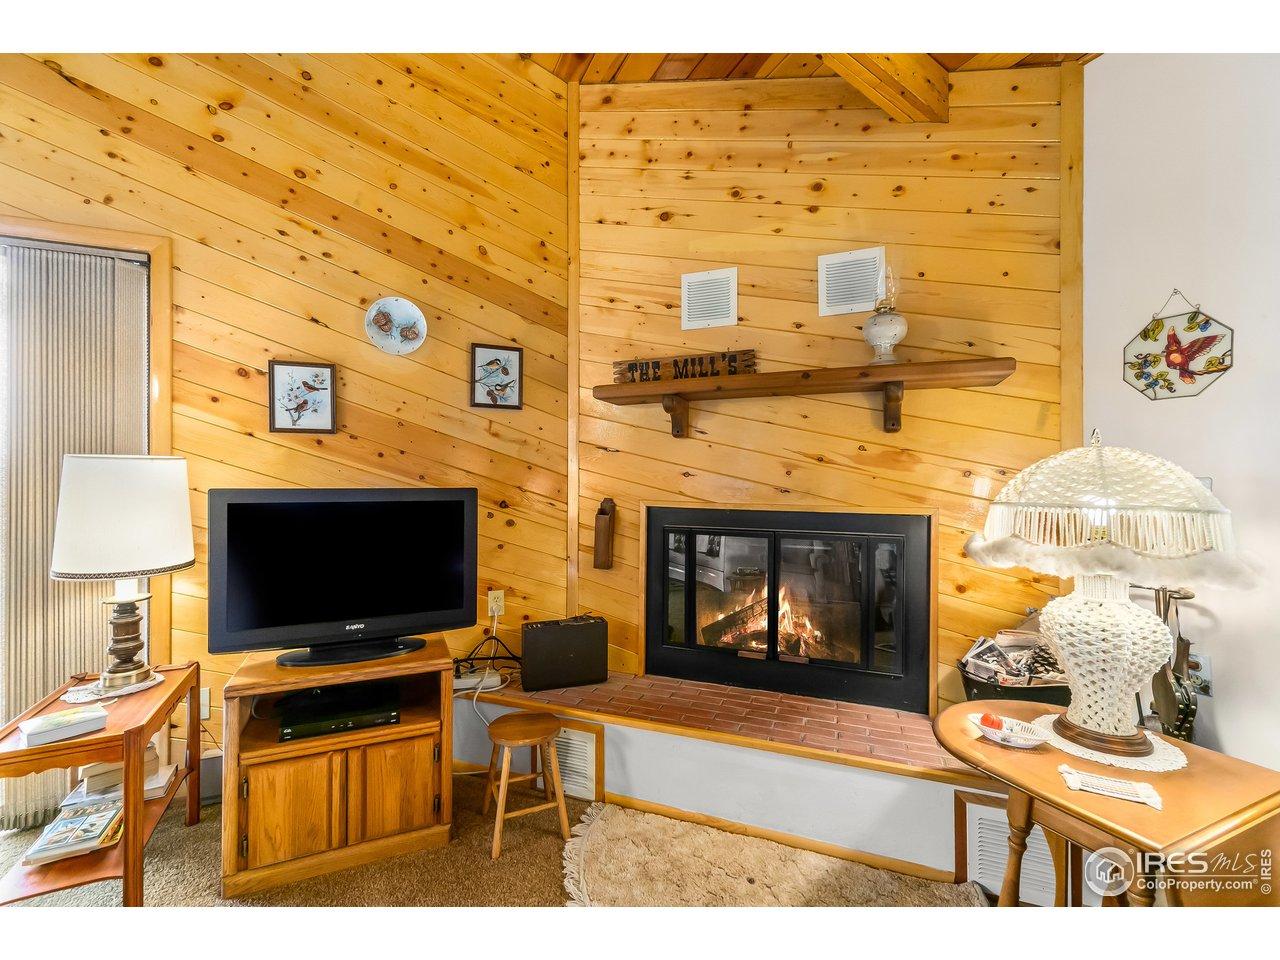 Satellite TV service available Wood burning fireplace